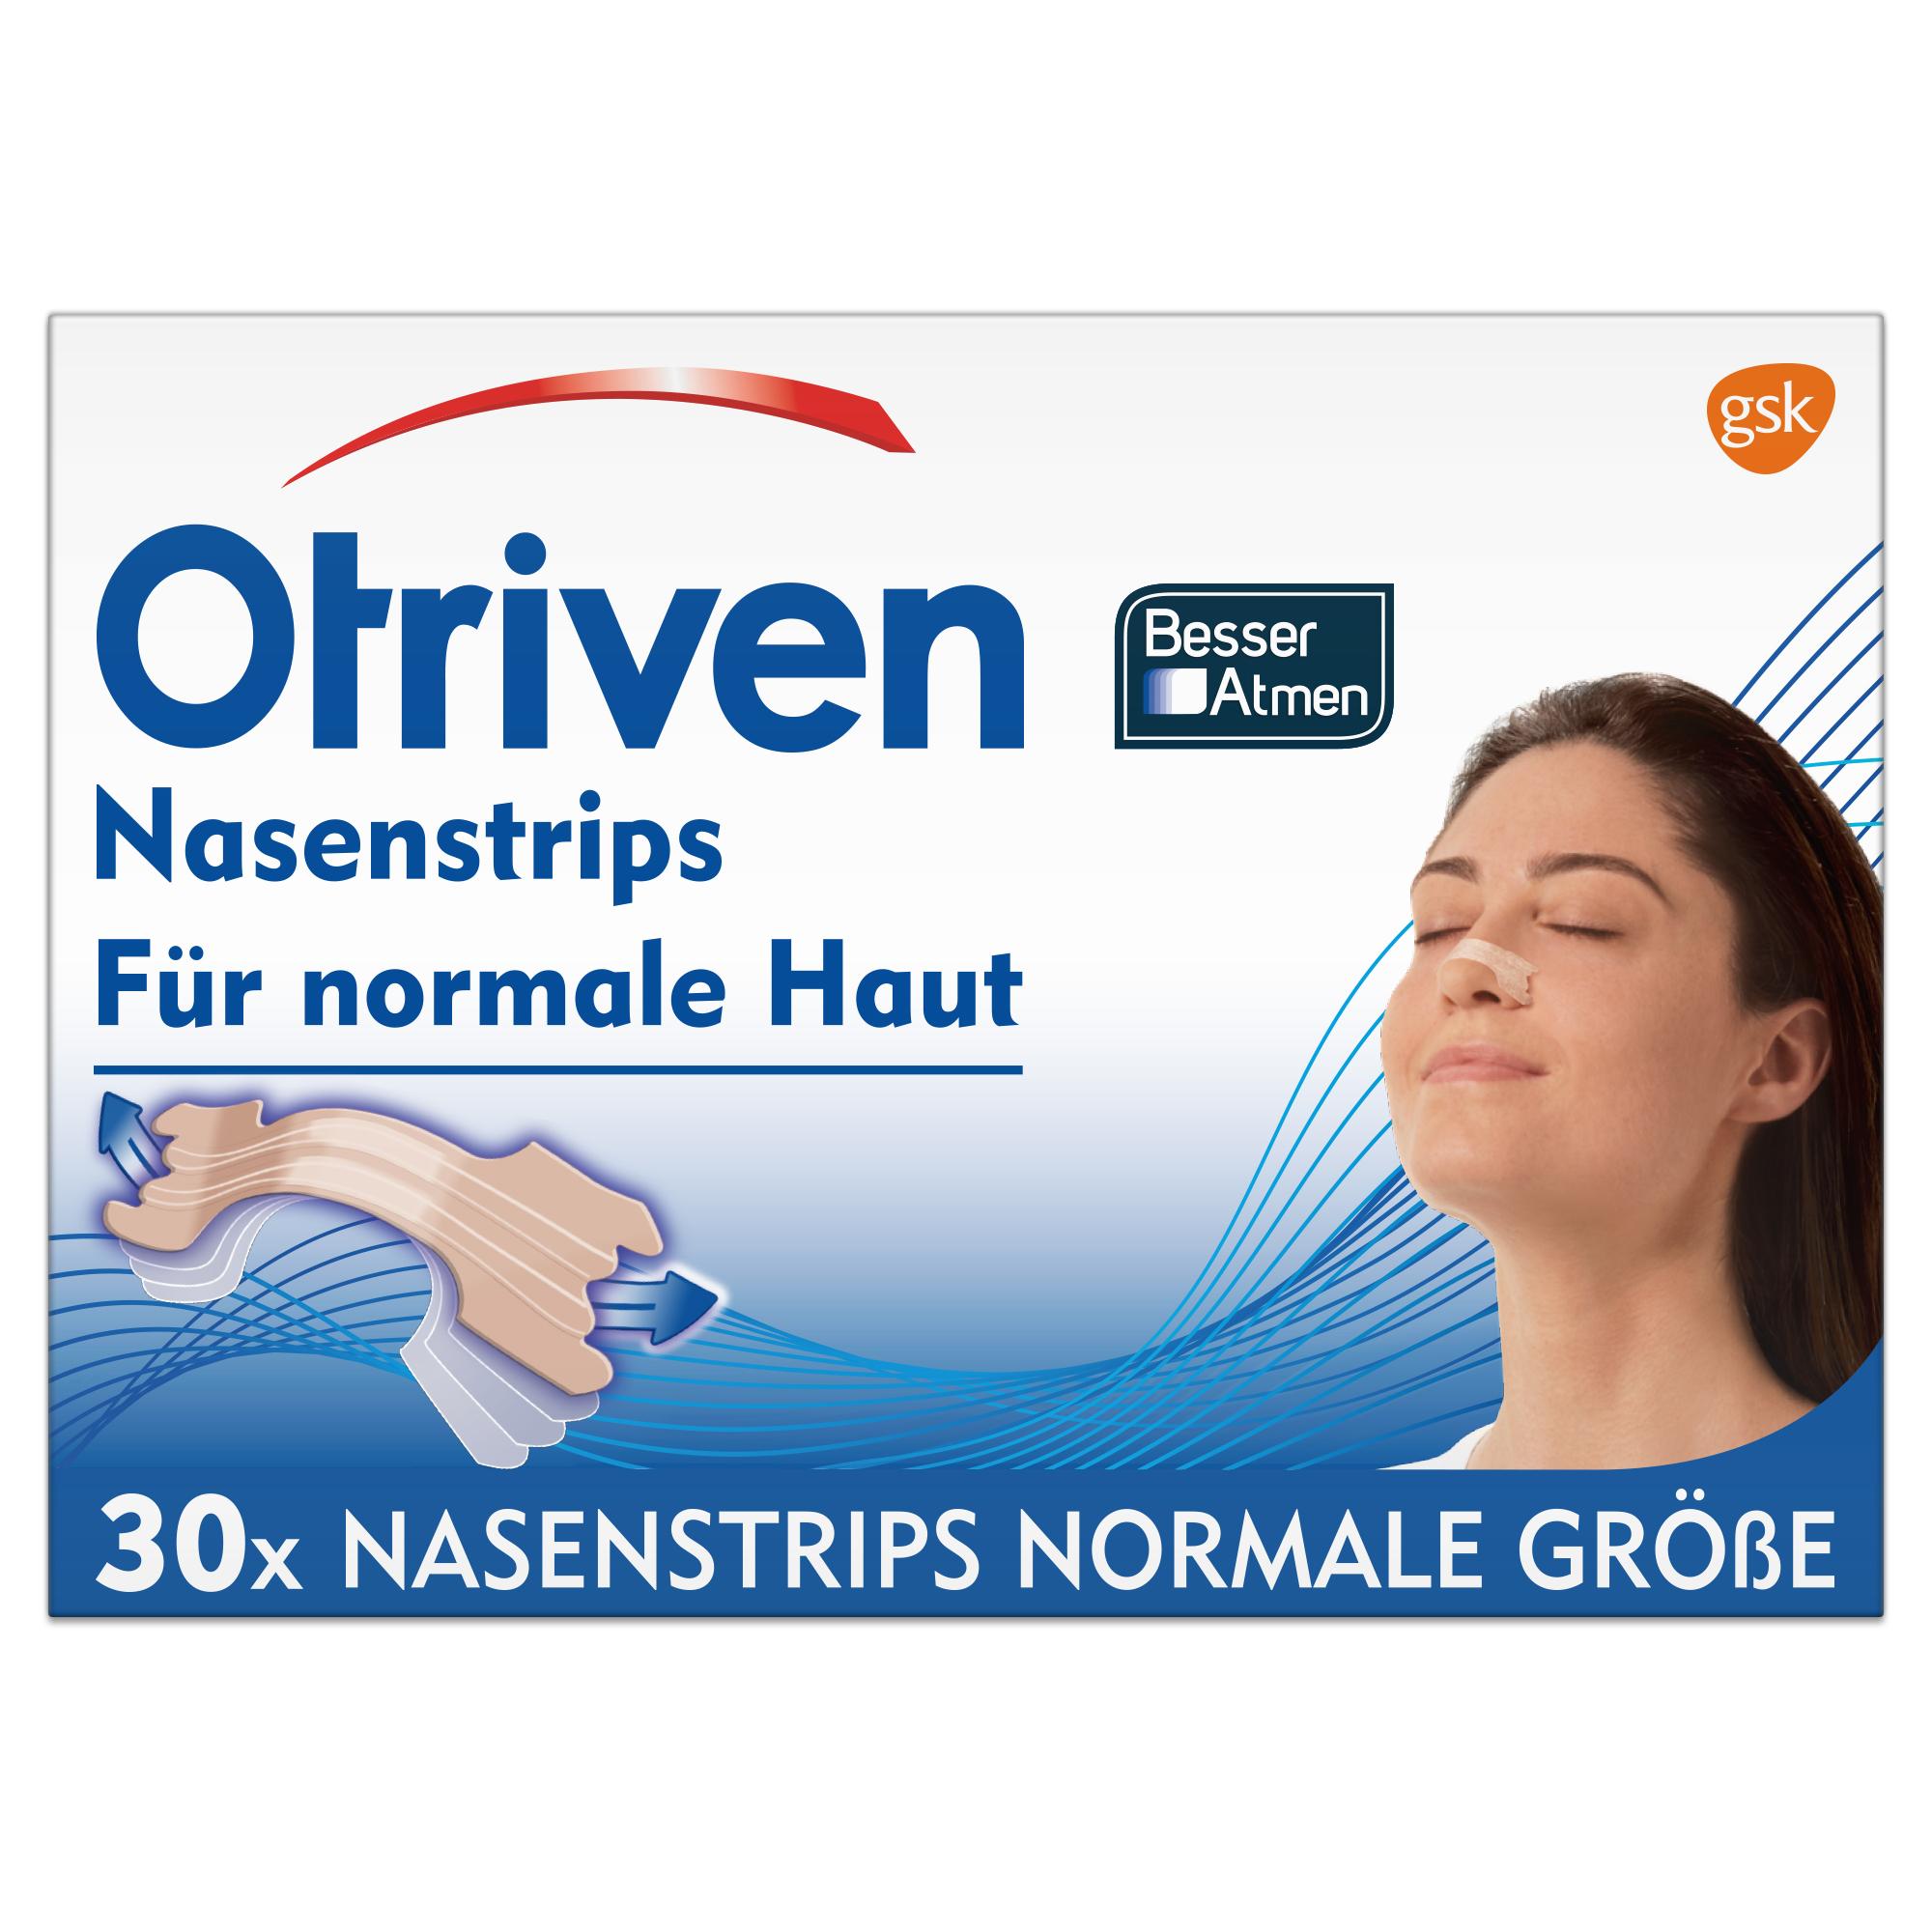 Otriven® Besser Atmen Nasenstrips normal beige